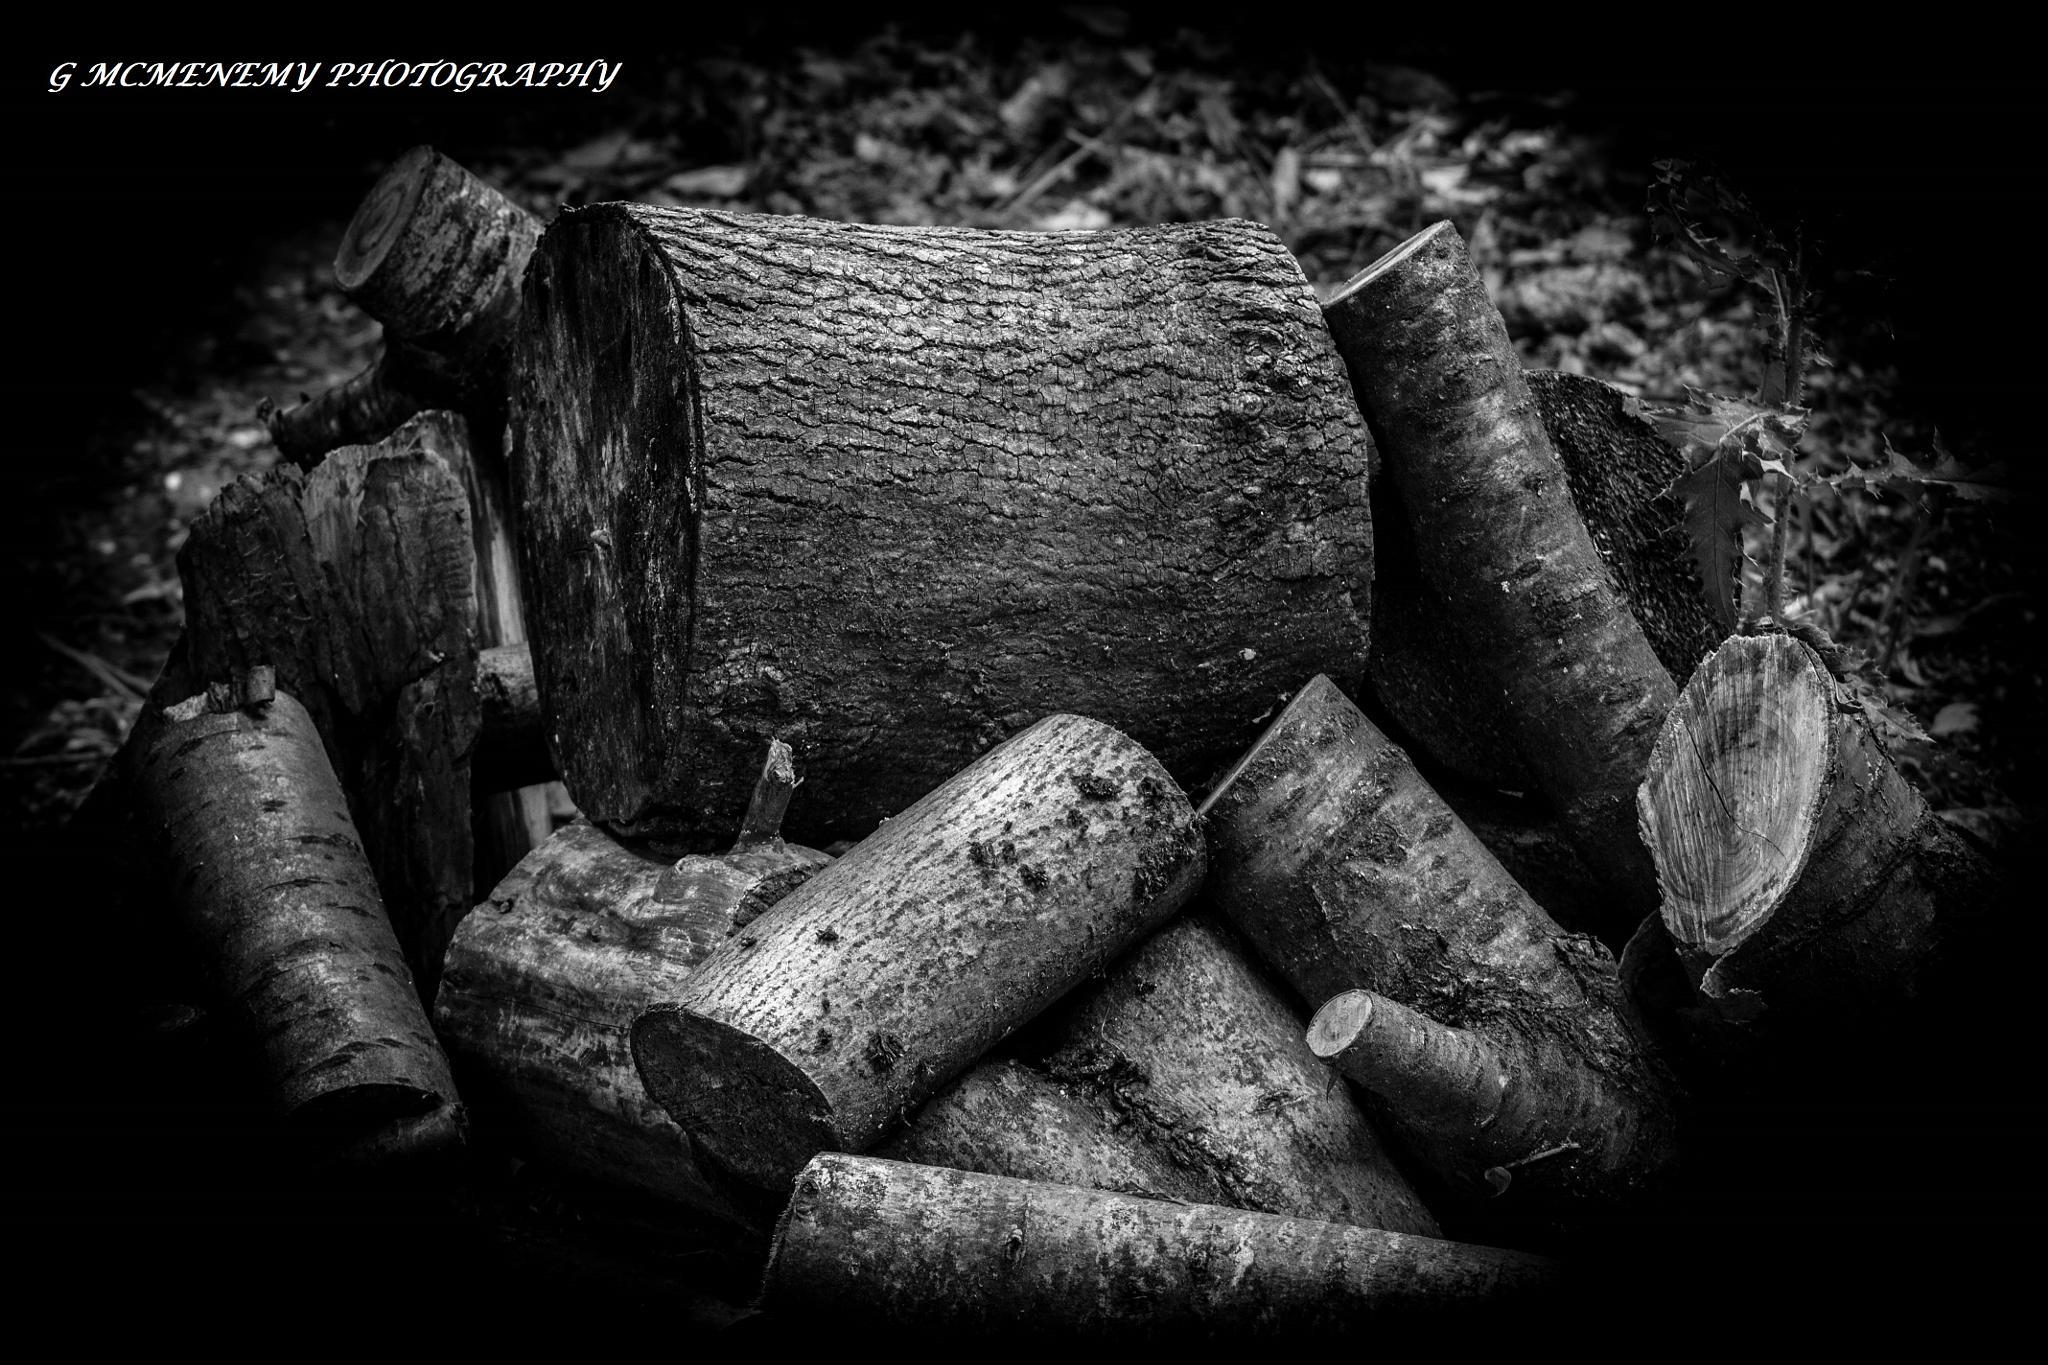 Log Pile by george.mcmenemy.7